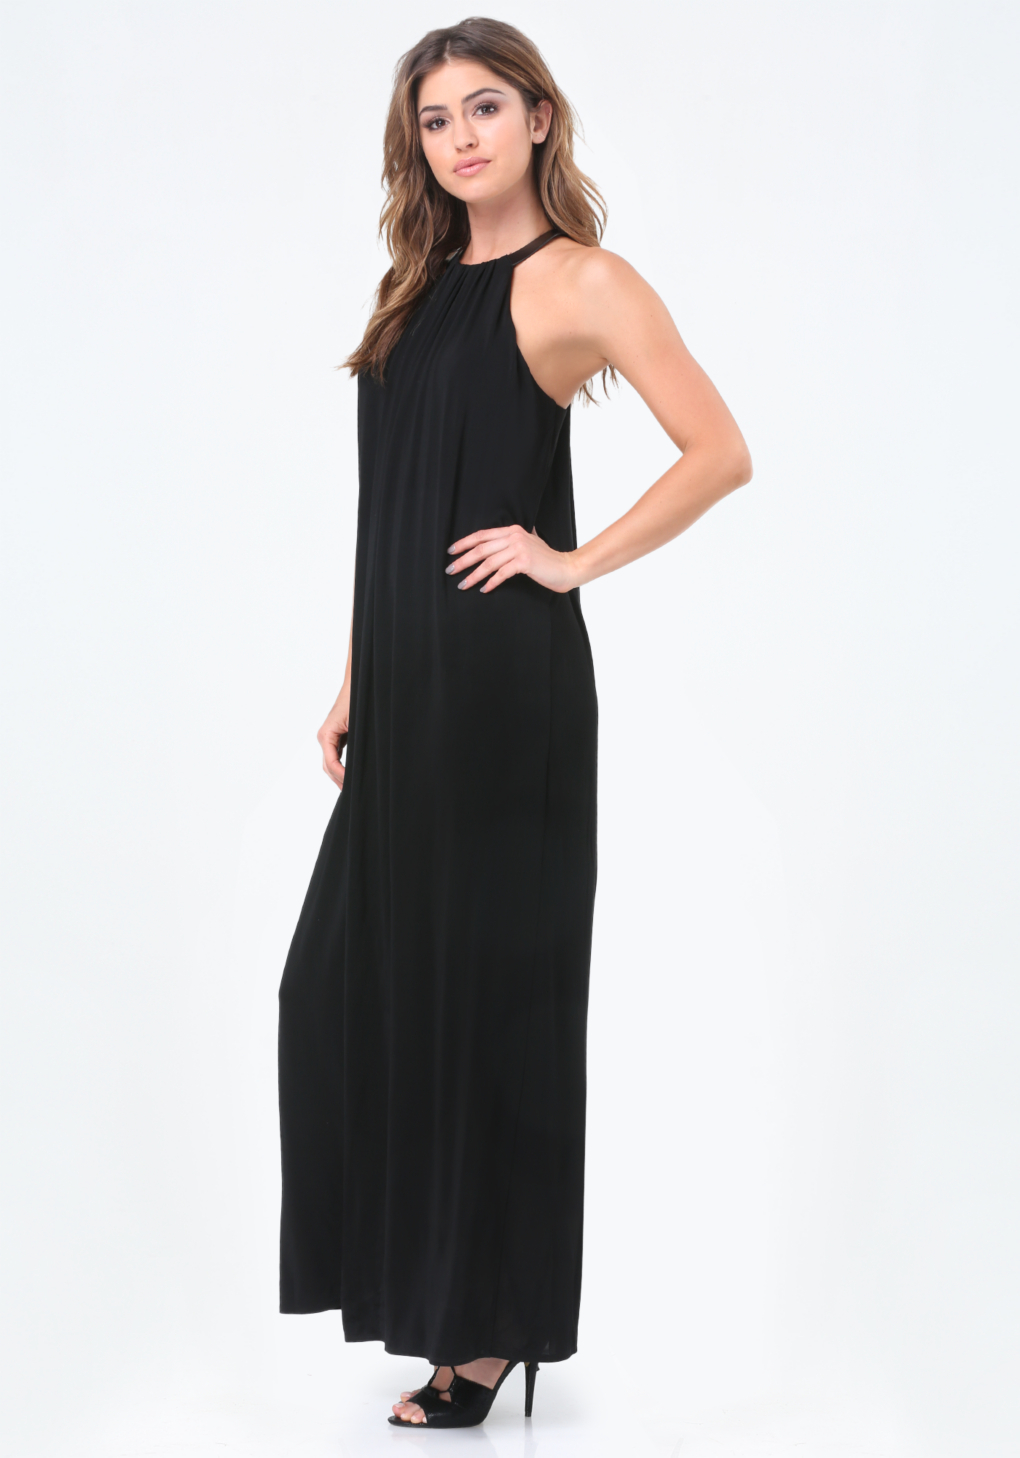 Lyst Bebe Leather Trim Maxi Dress In Black